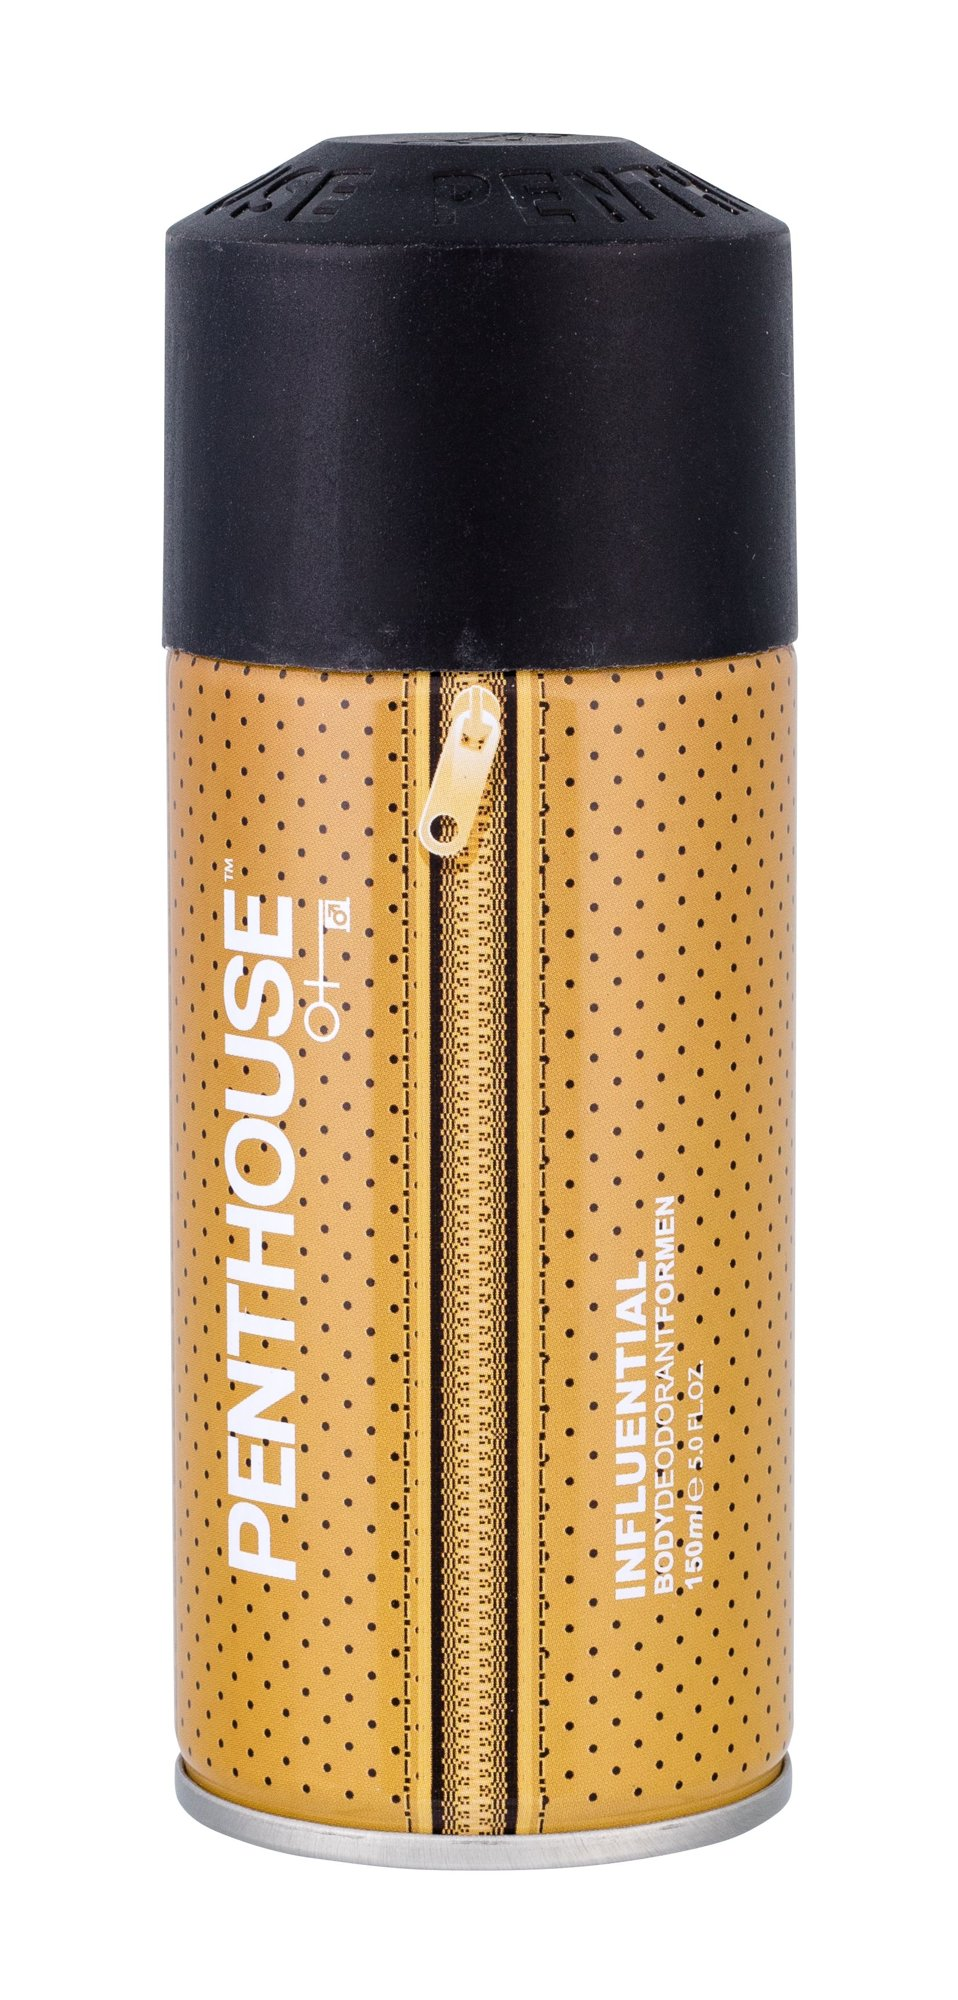 Penthouse Influential Deodorant 150ml